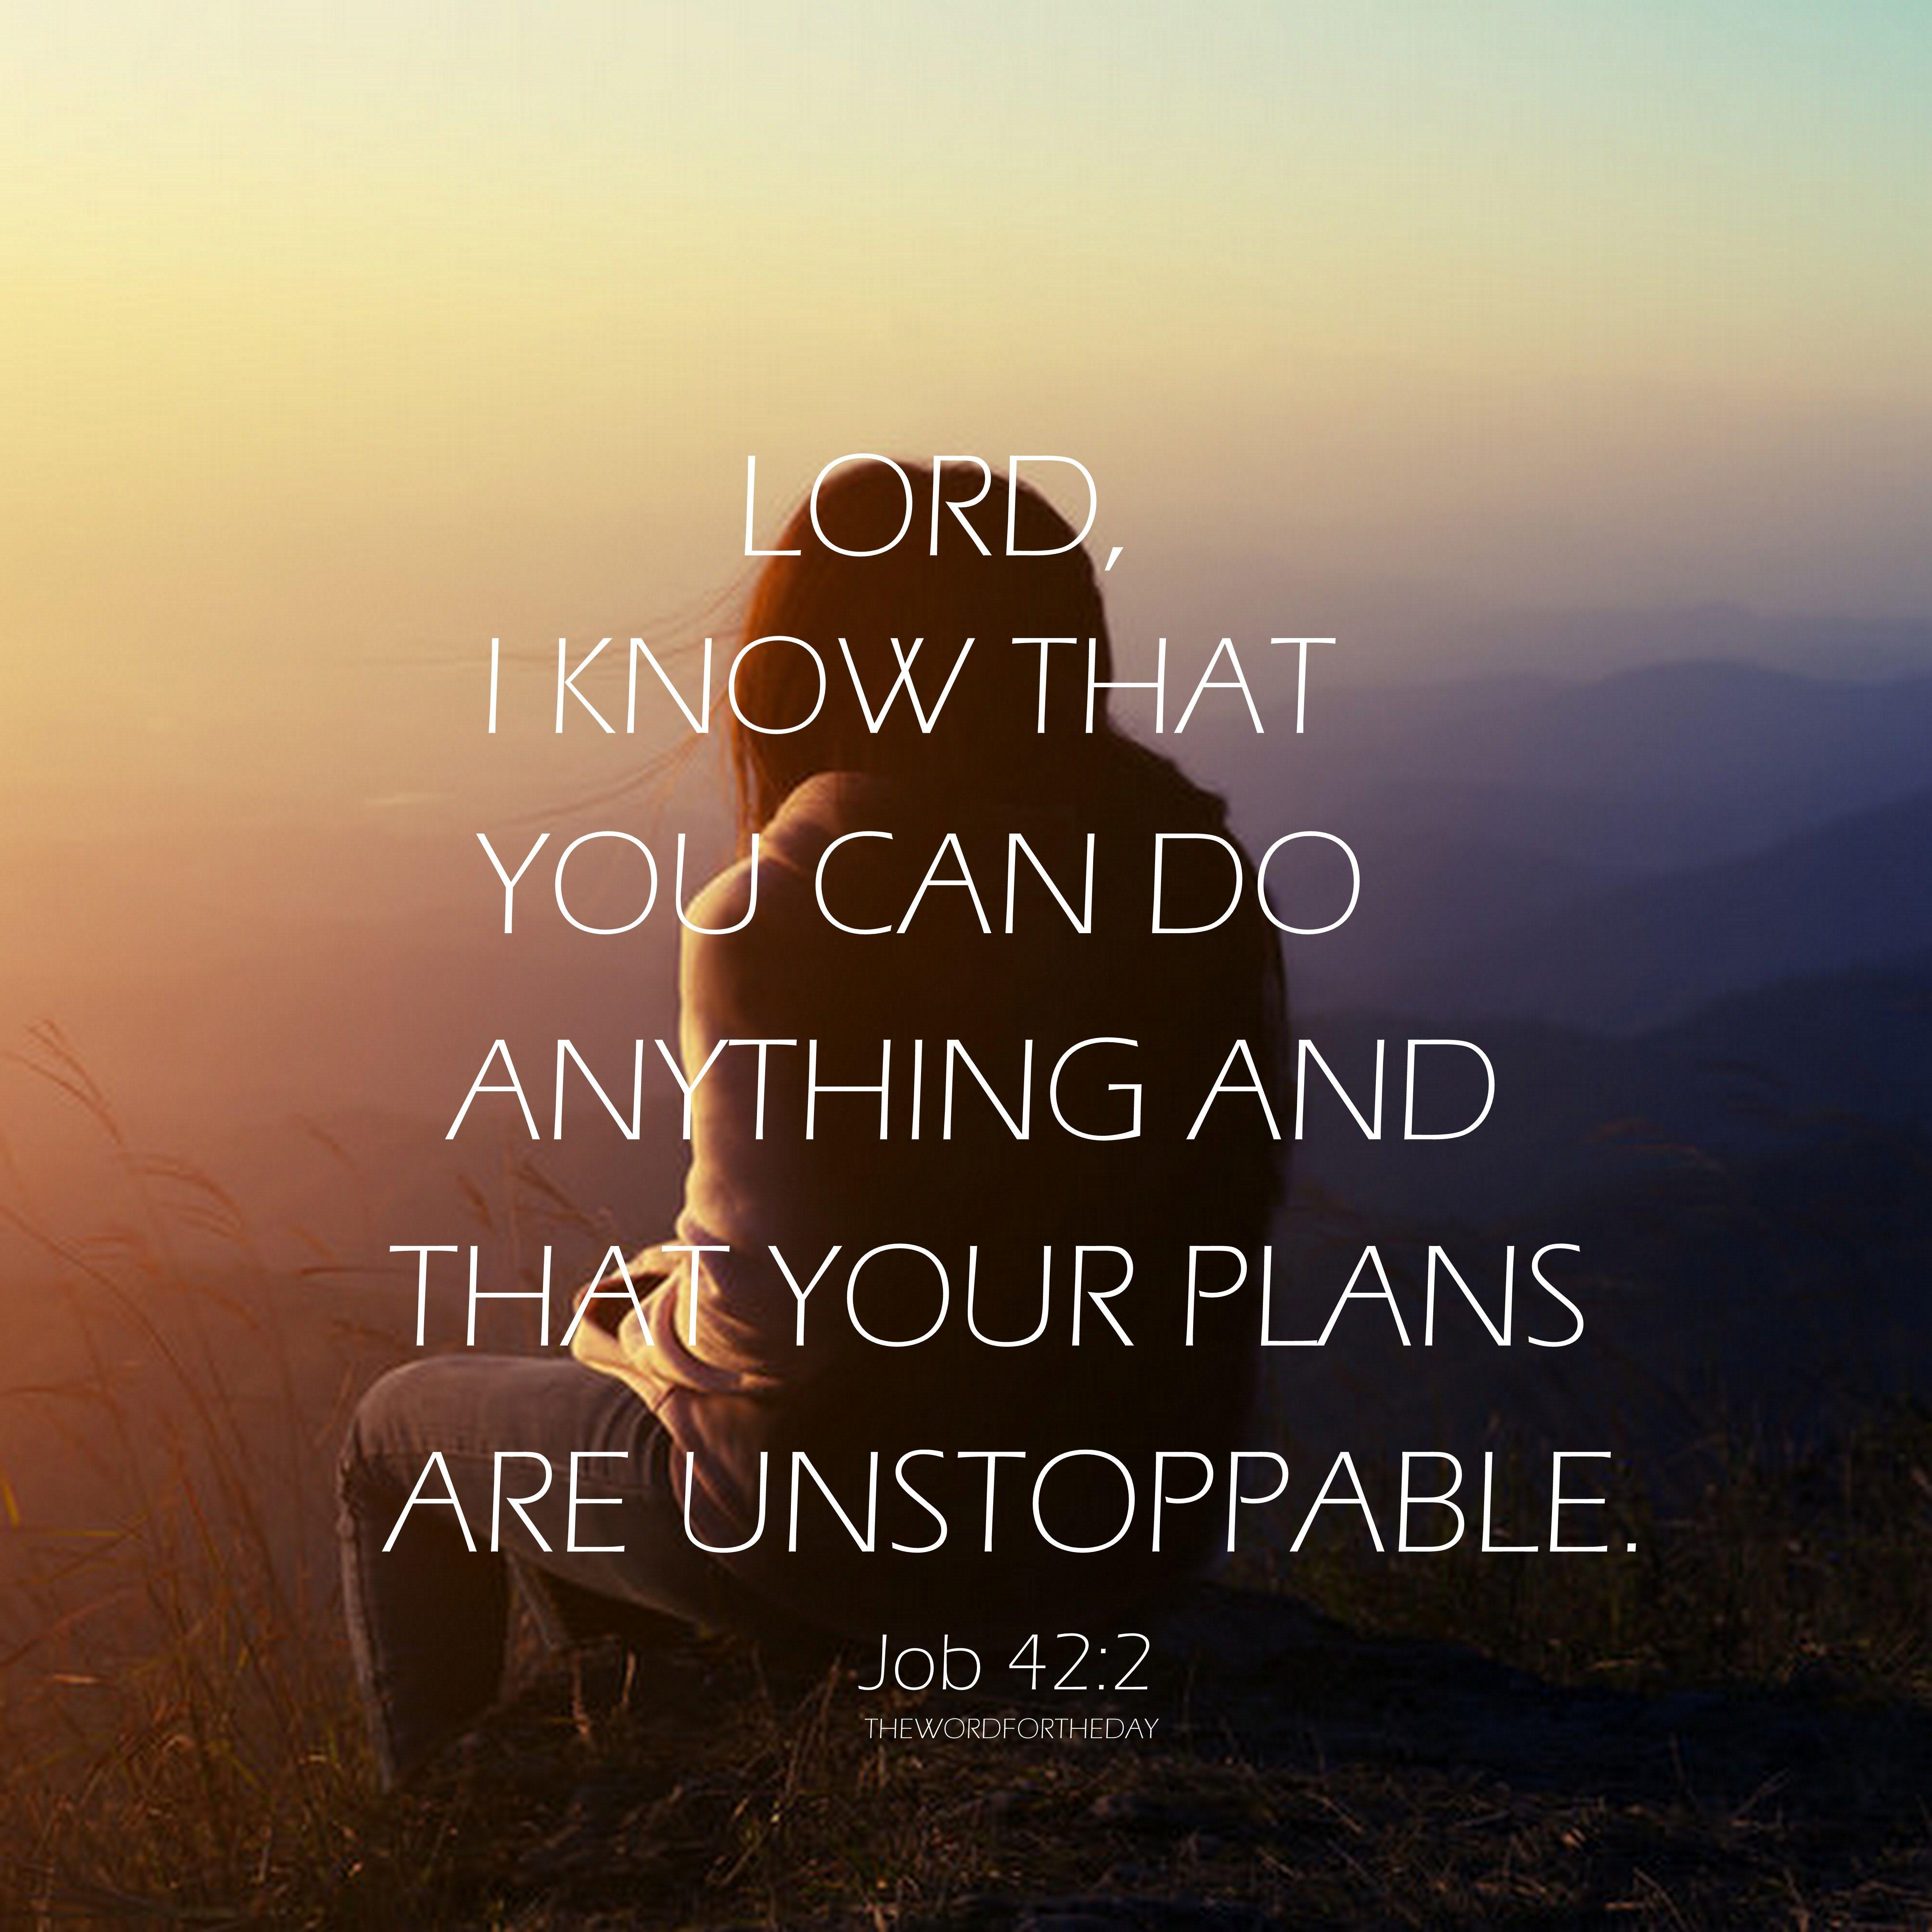 Bible Quotes About Life: #Job 42:2 #bible Verse #Bible Quotes #christian Life